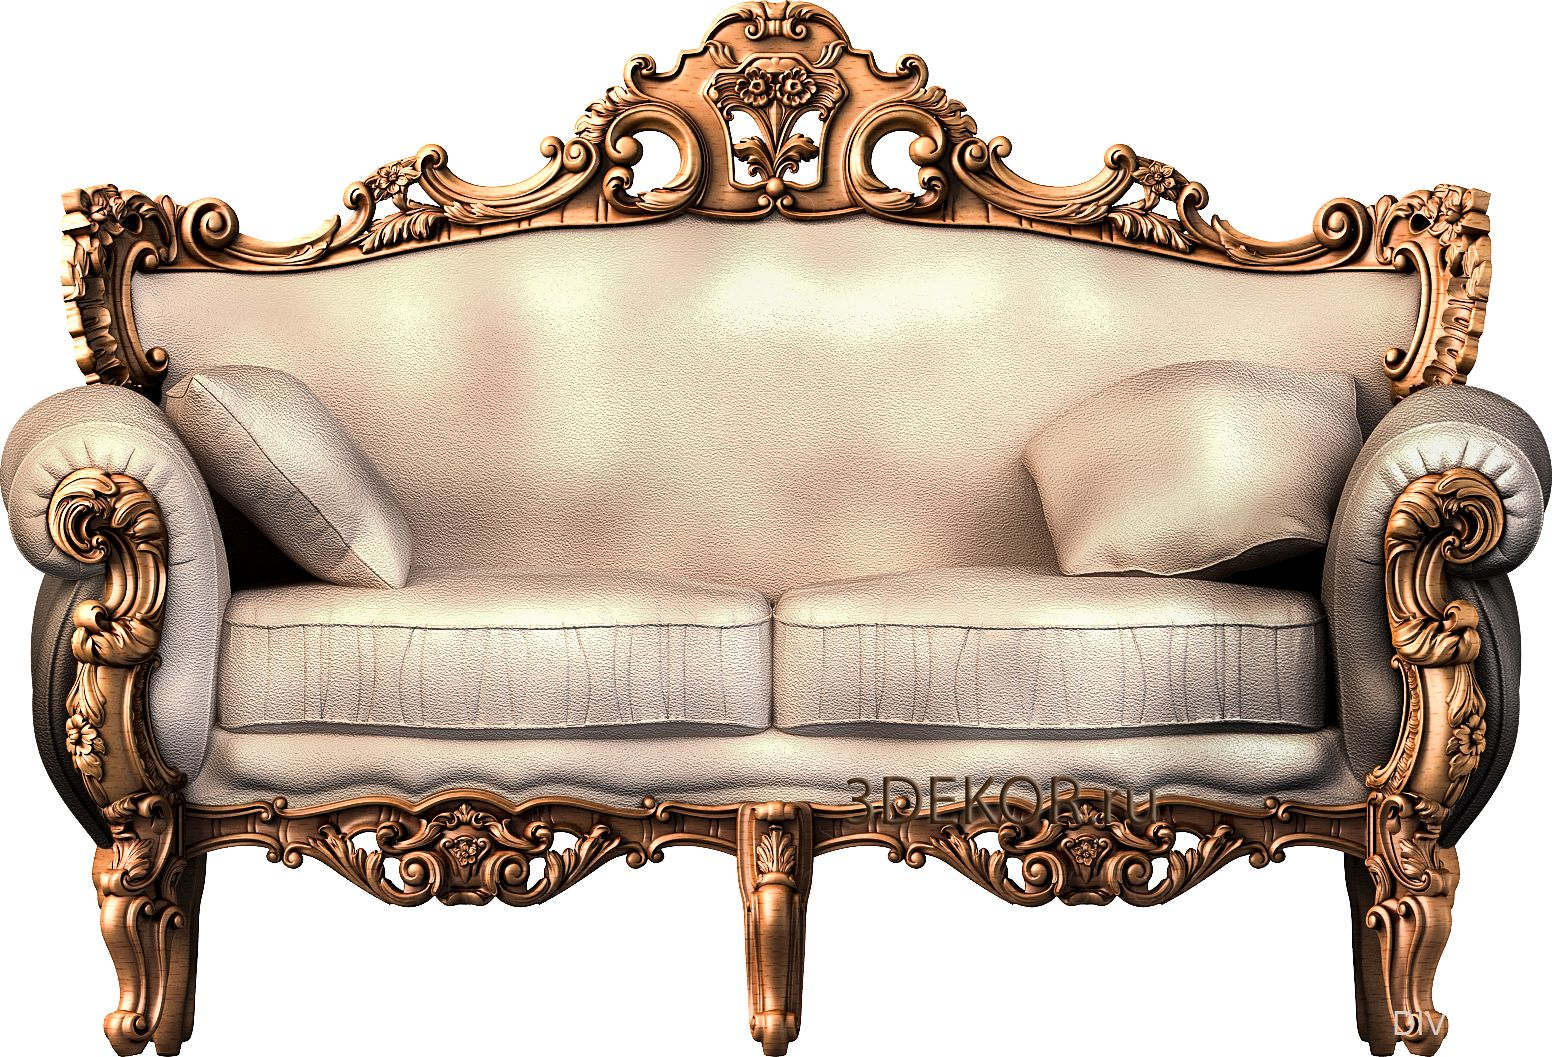 диван из каталога 3декор